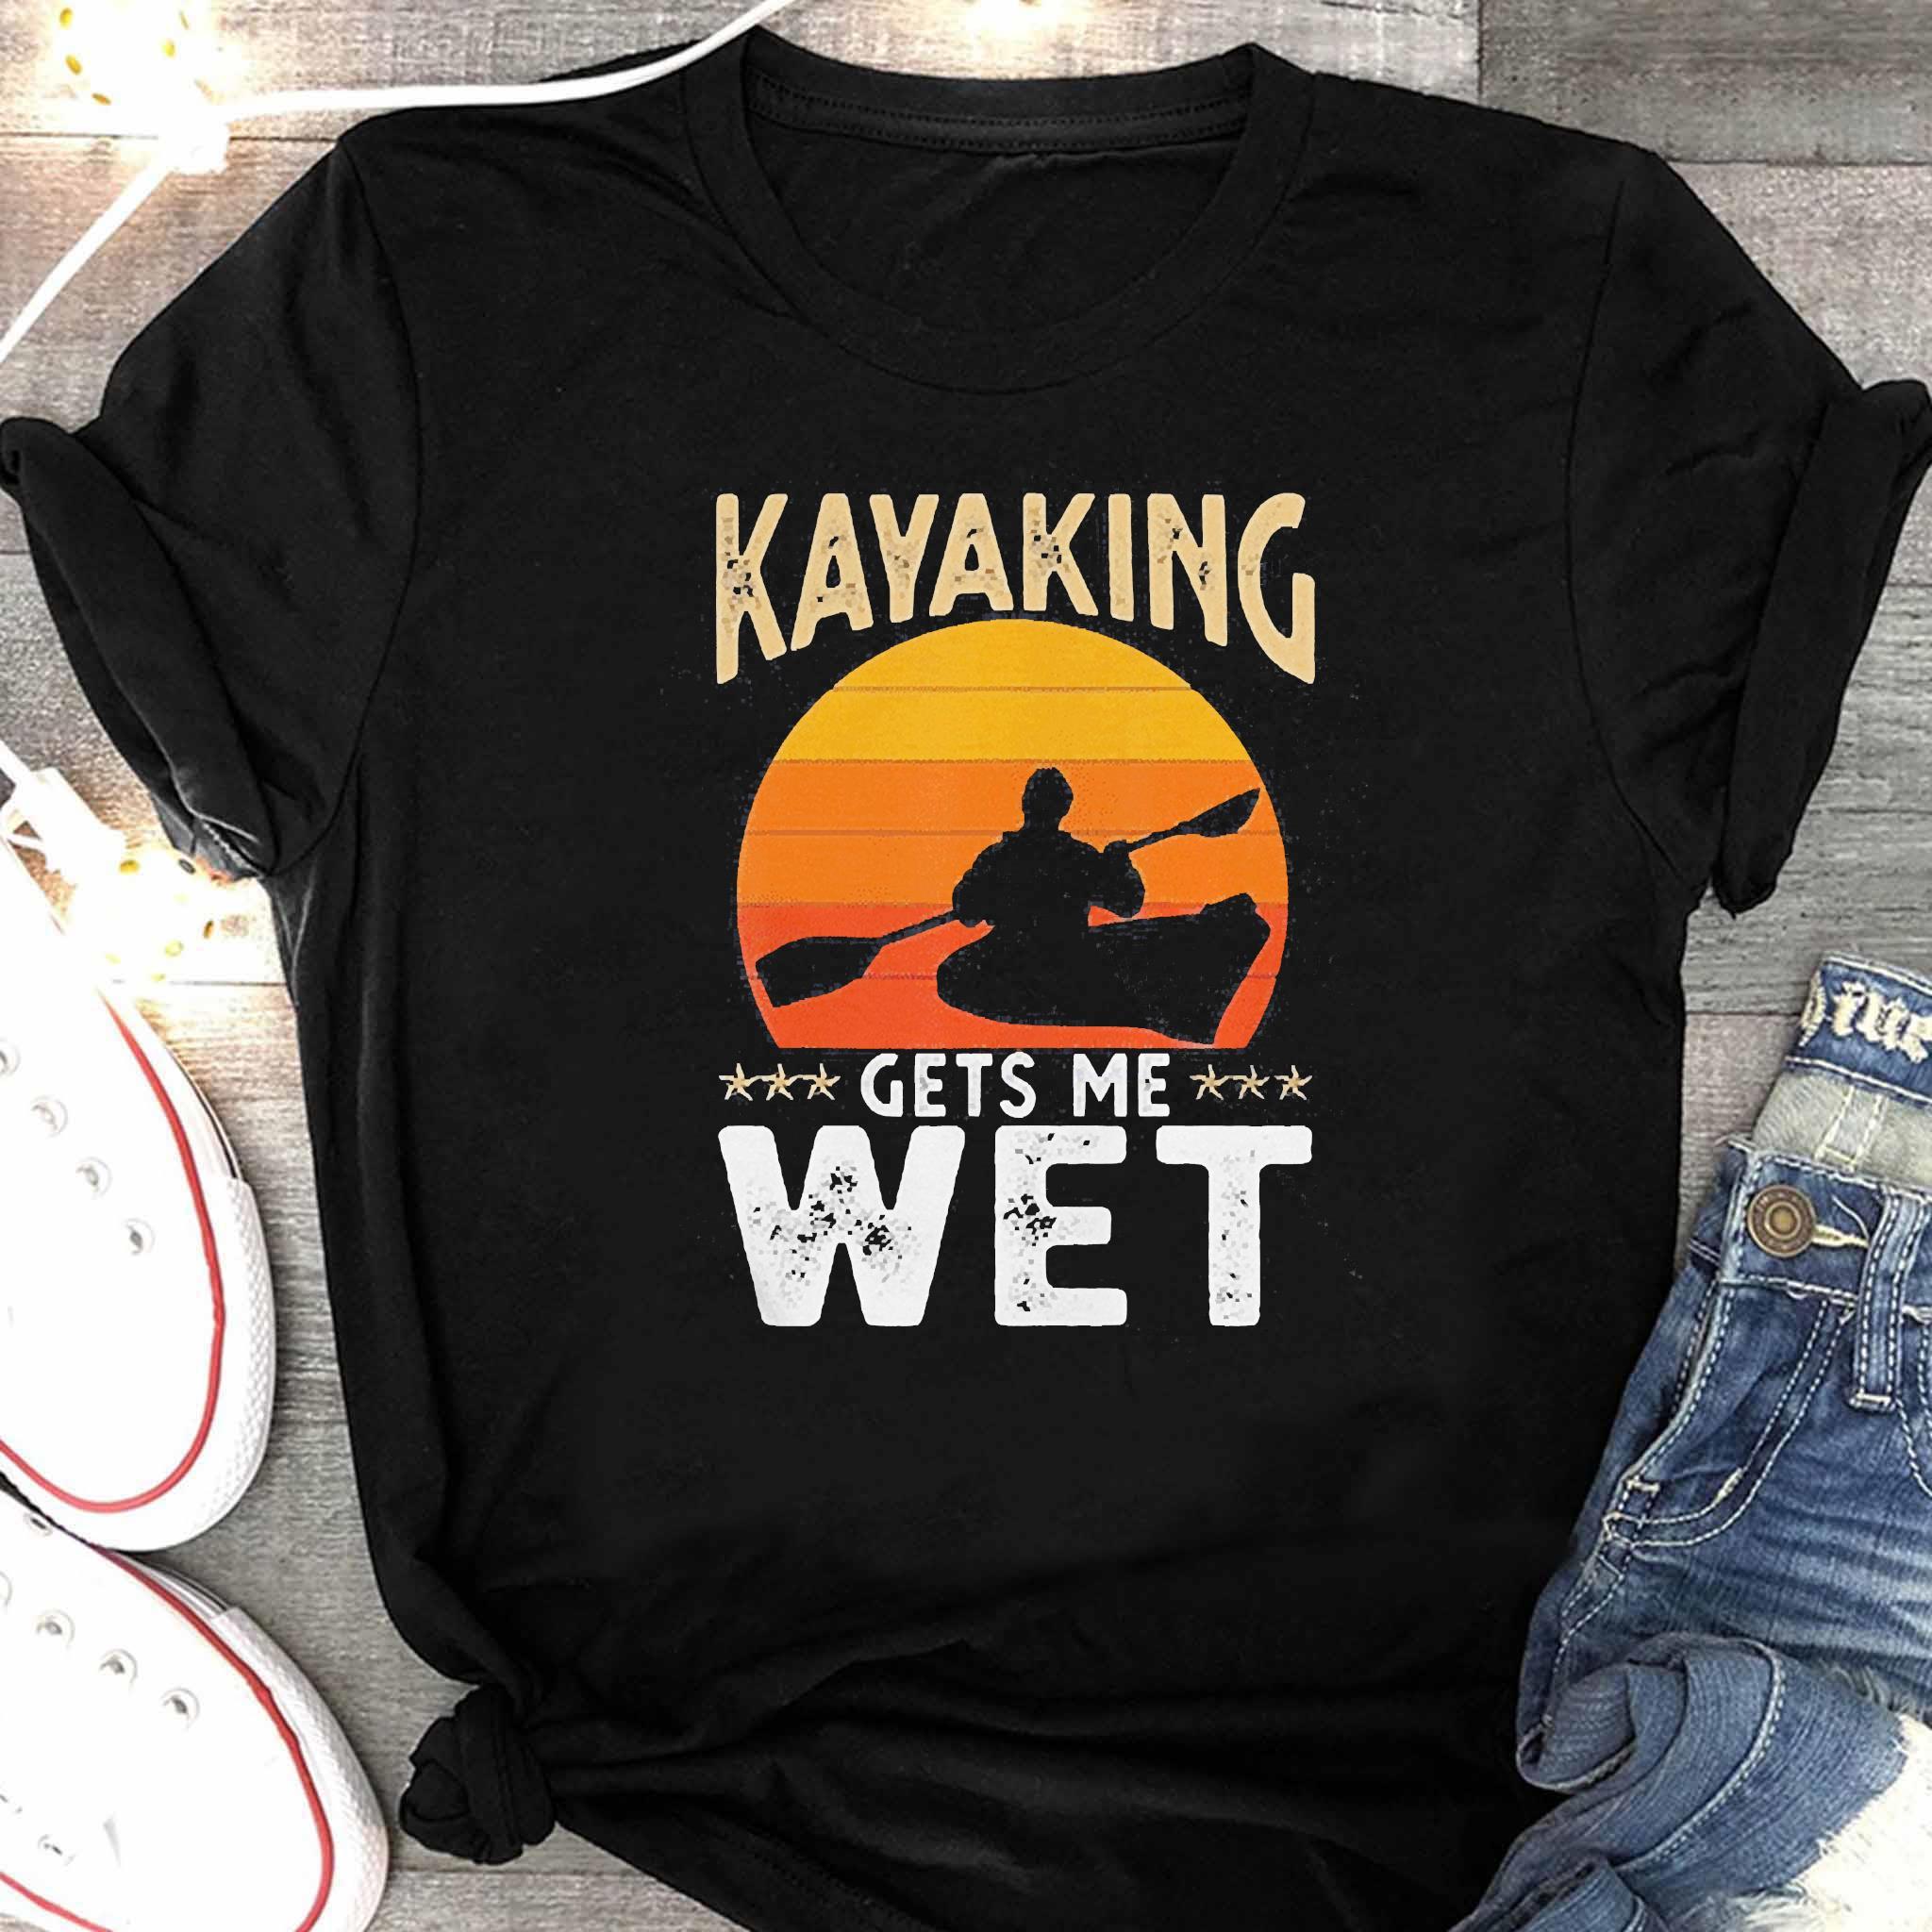 Kayaking Gets Me Wet Shirt Women's Shirt